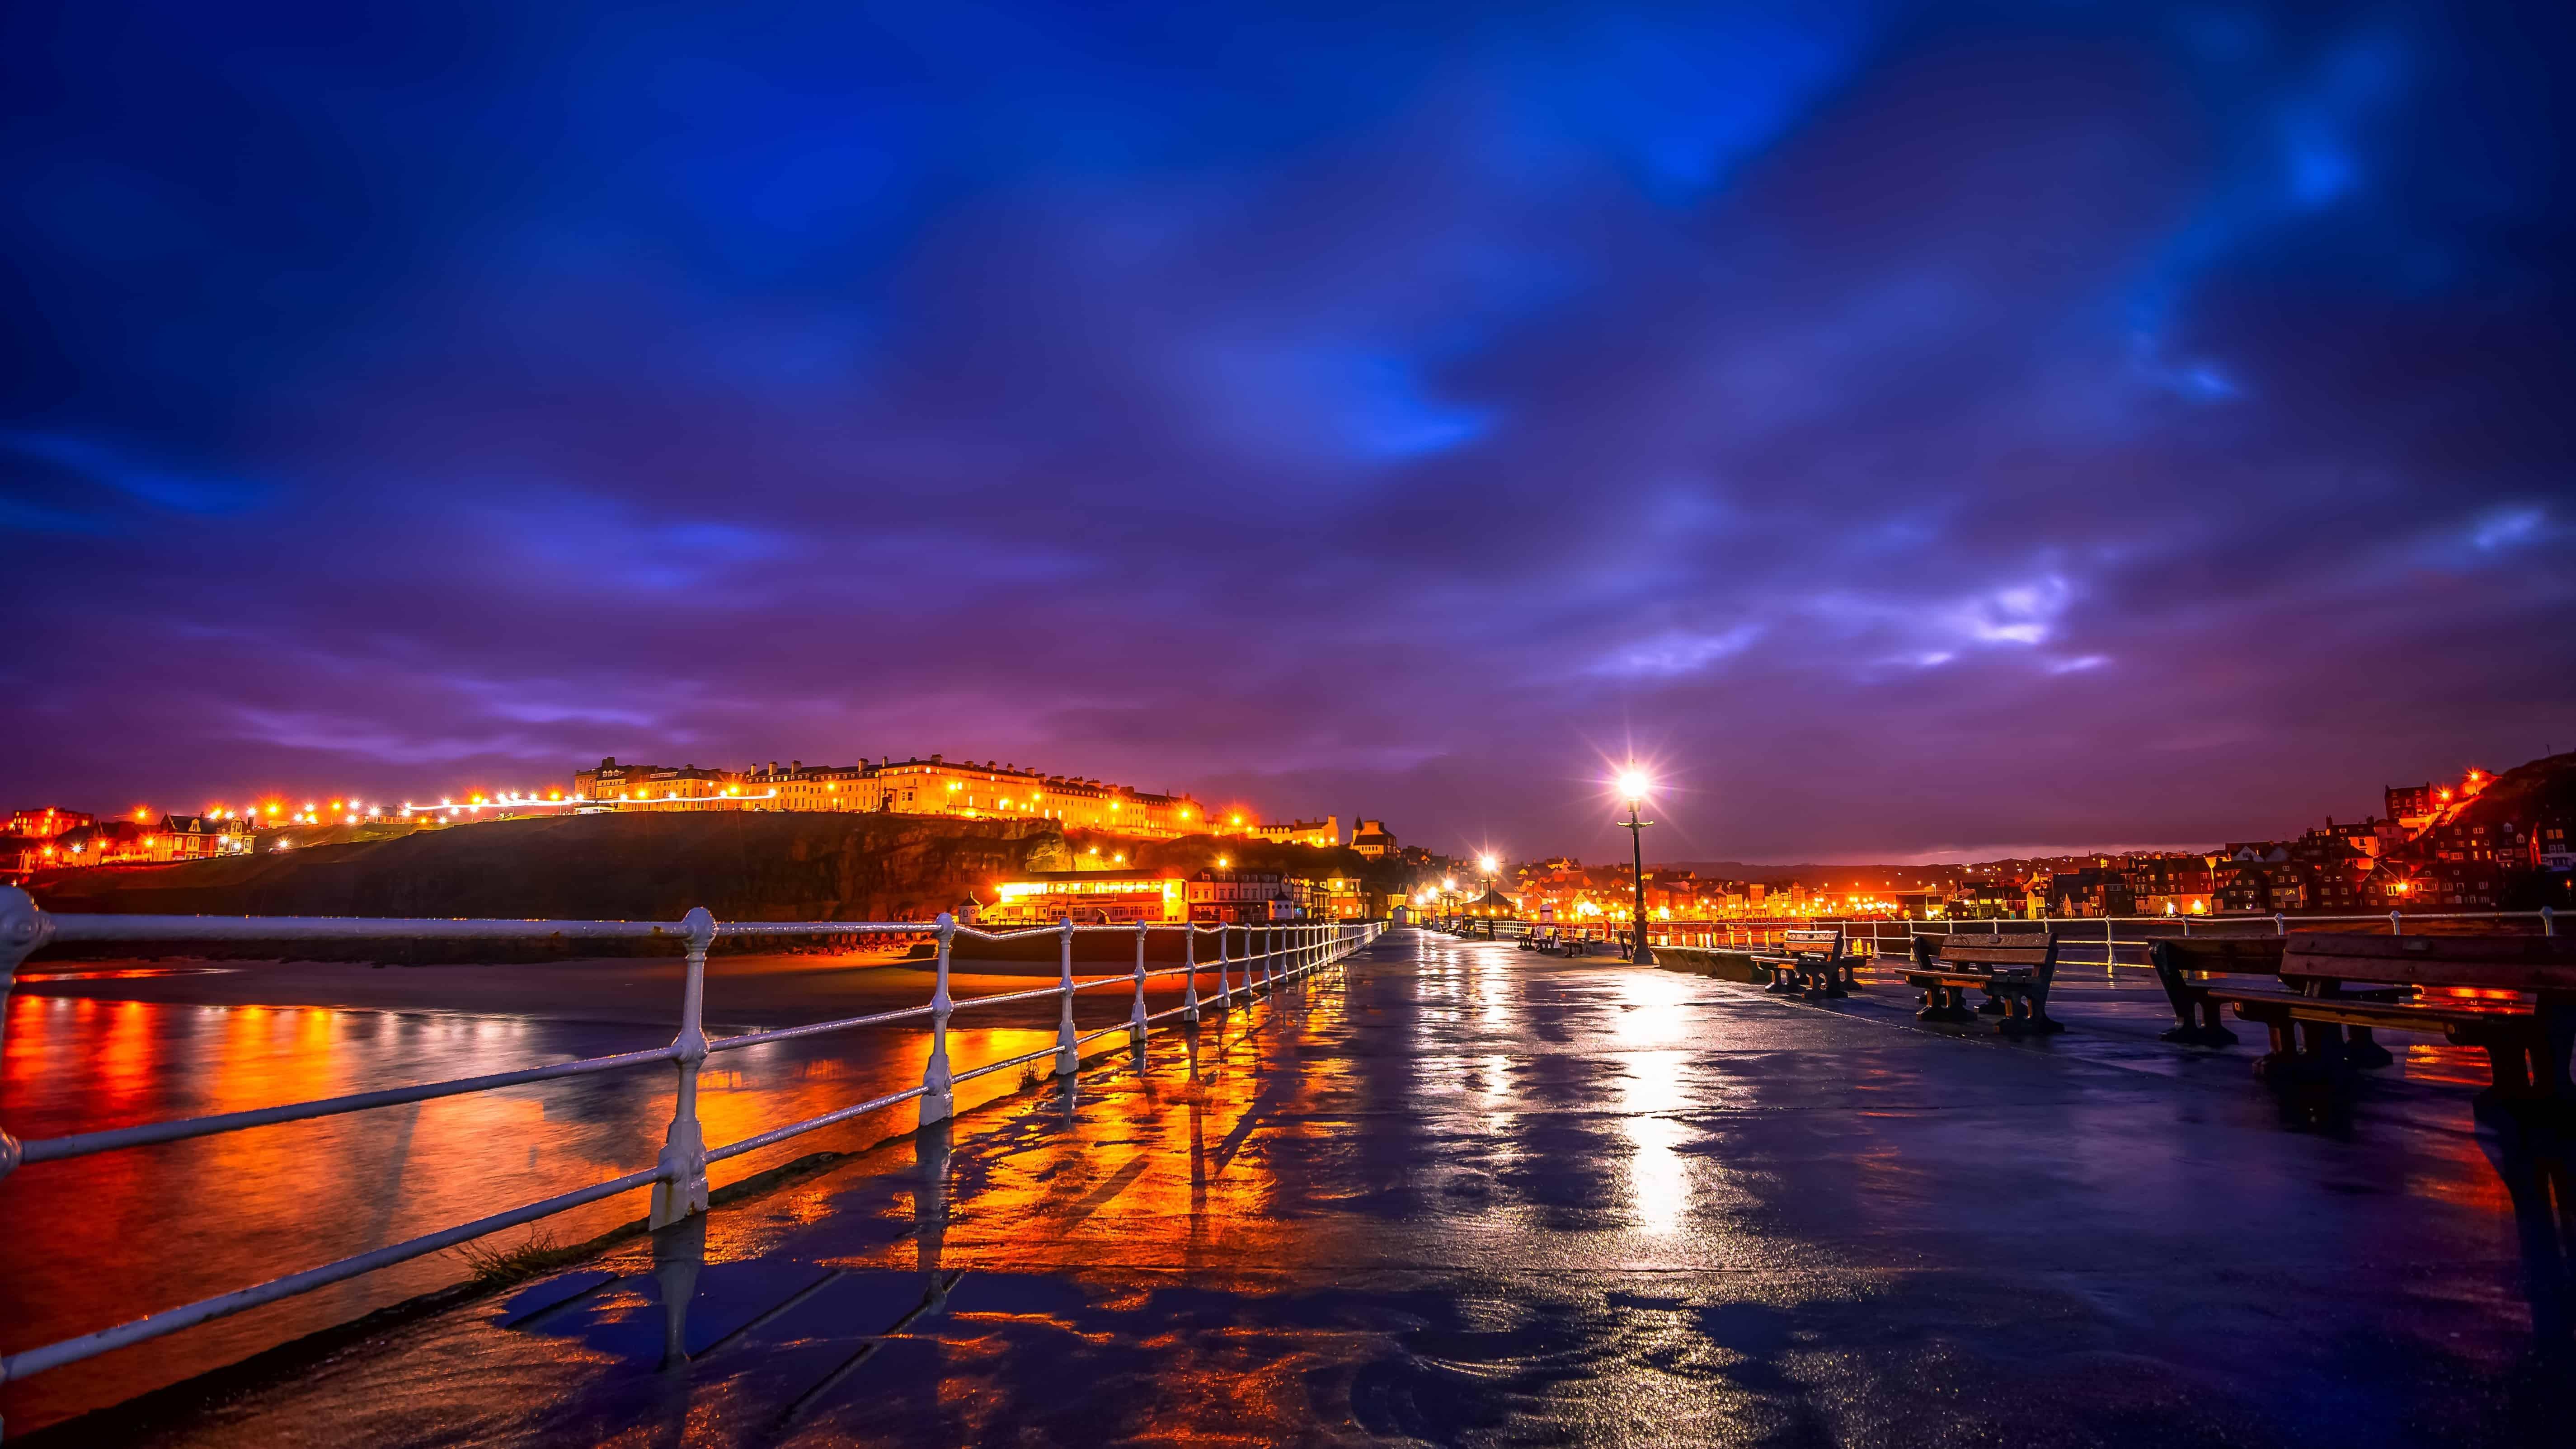 Sea Sunset Wallpaper Hd Free Picture Sunset Bridge City Reflection Dusk